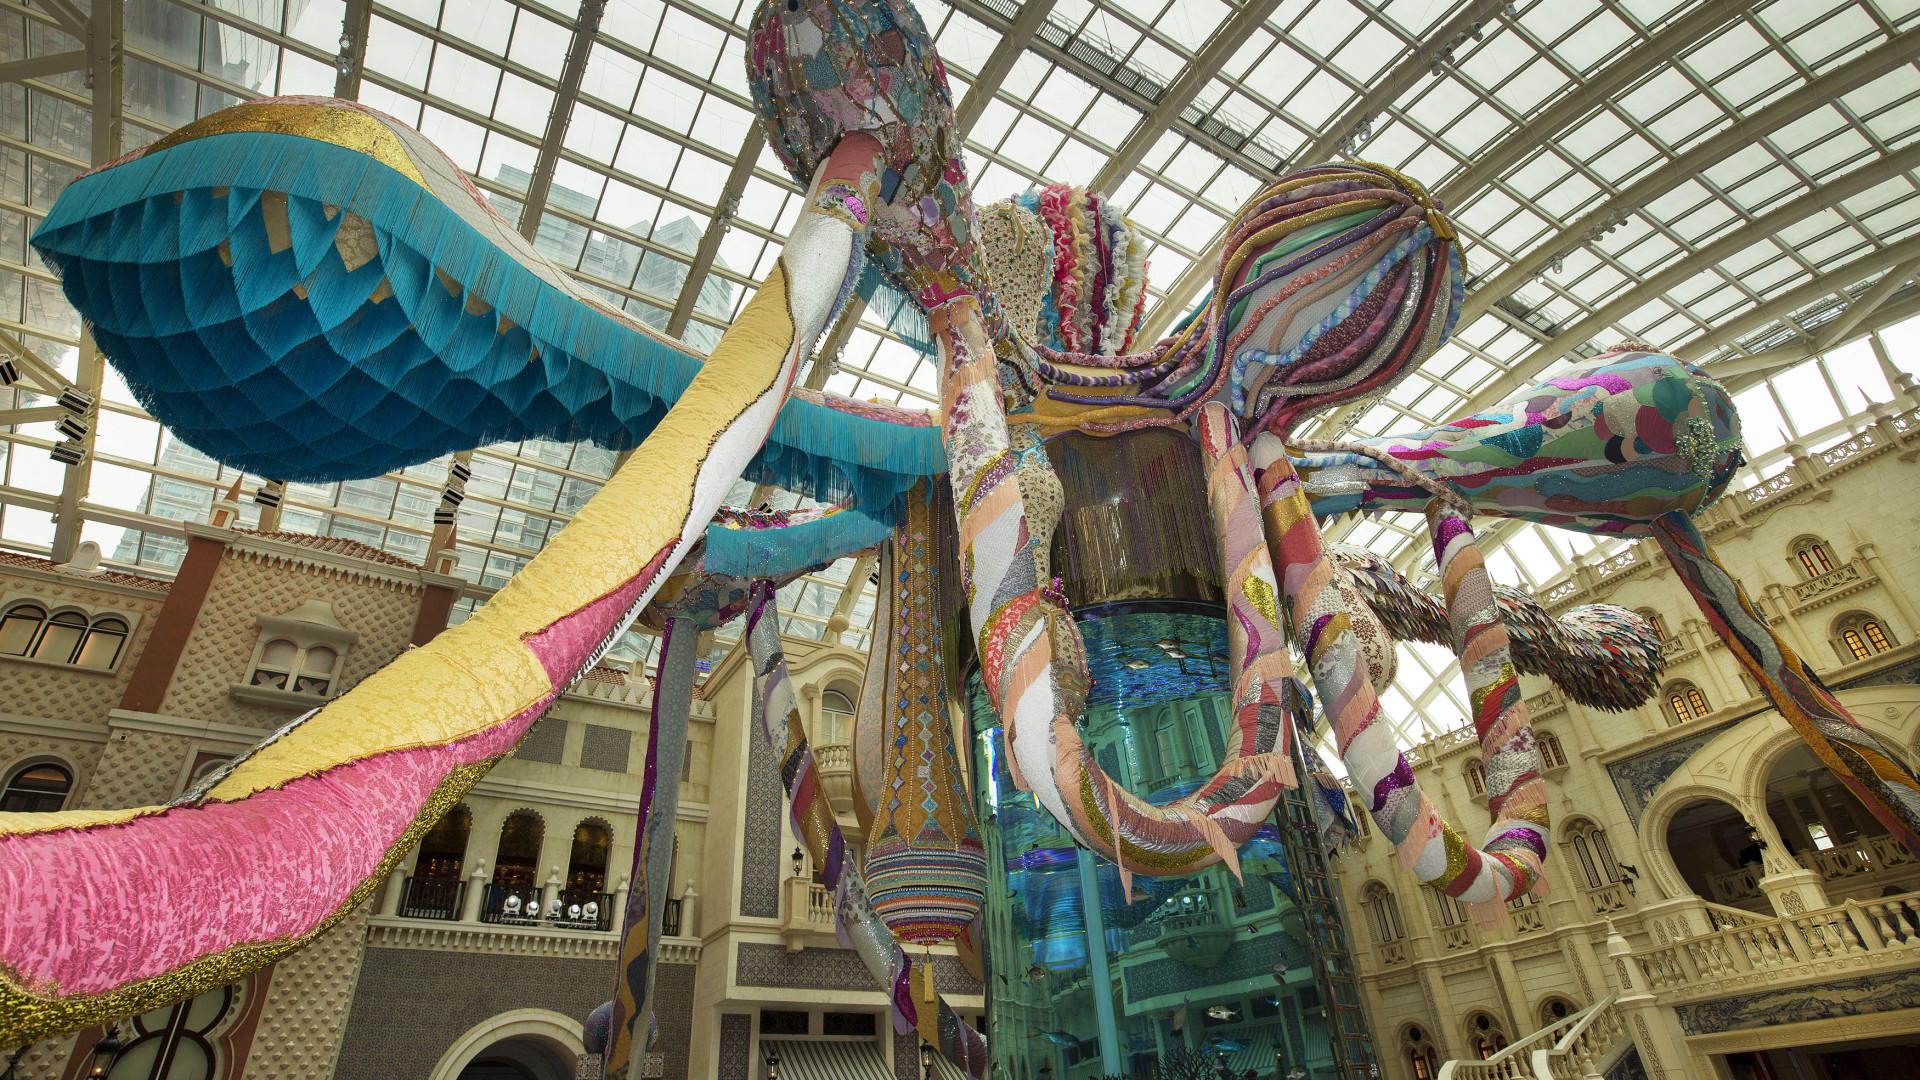 Guggenheim Bilbao considera Joana Vasconcelos artista relevante